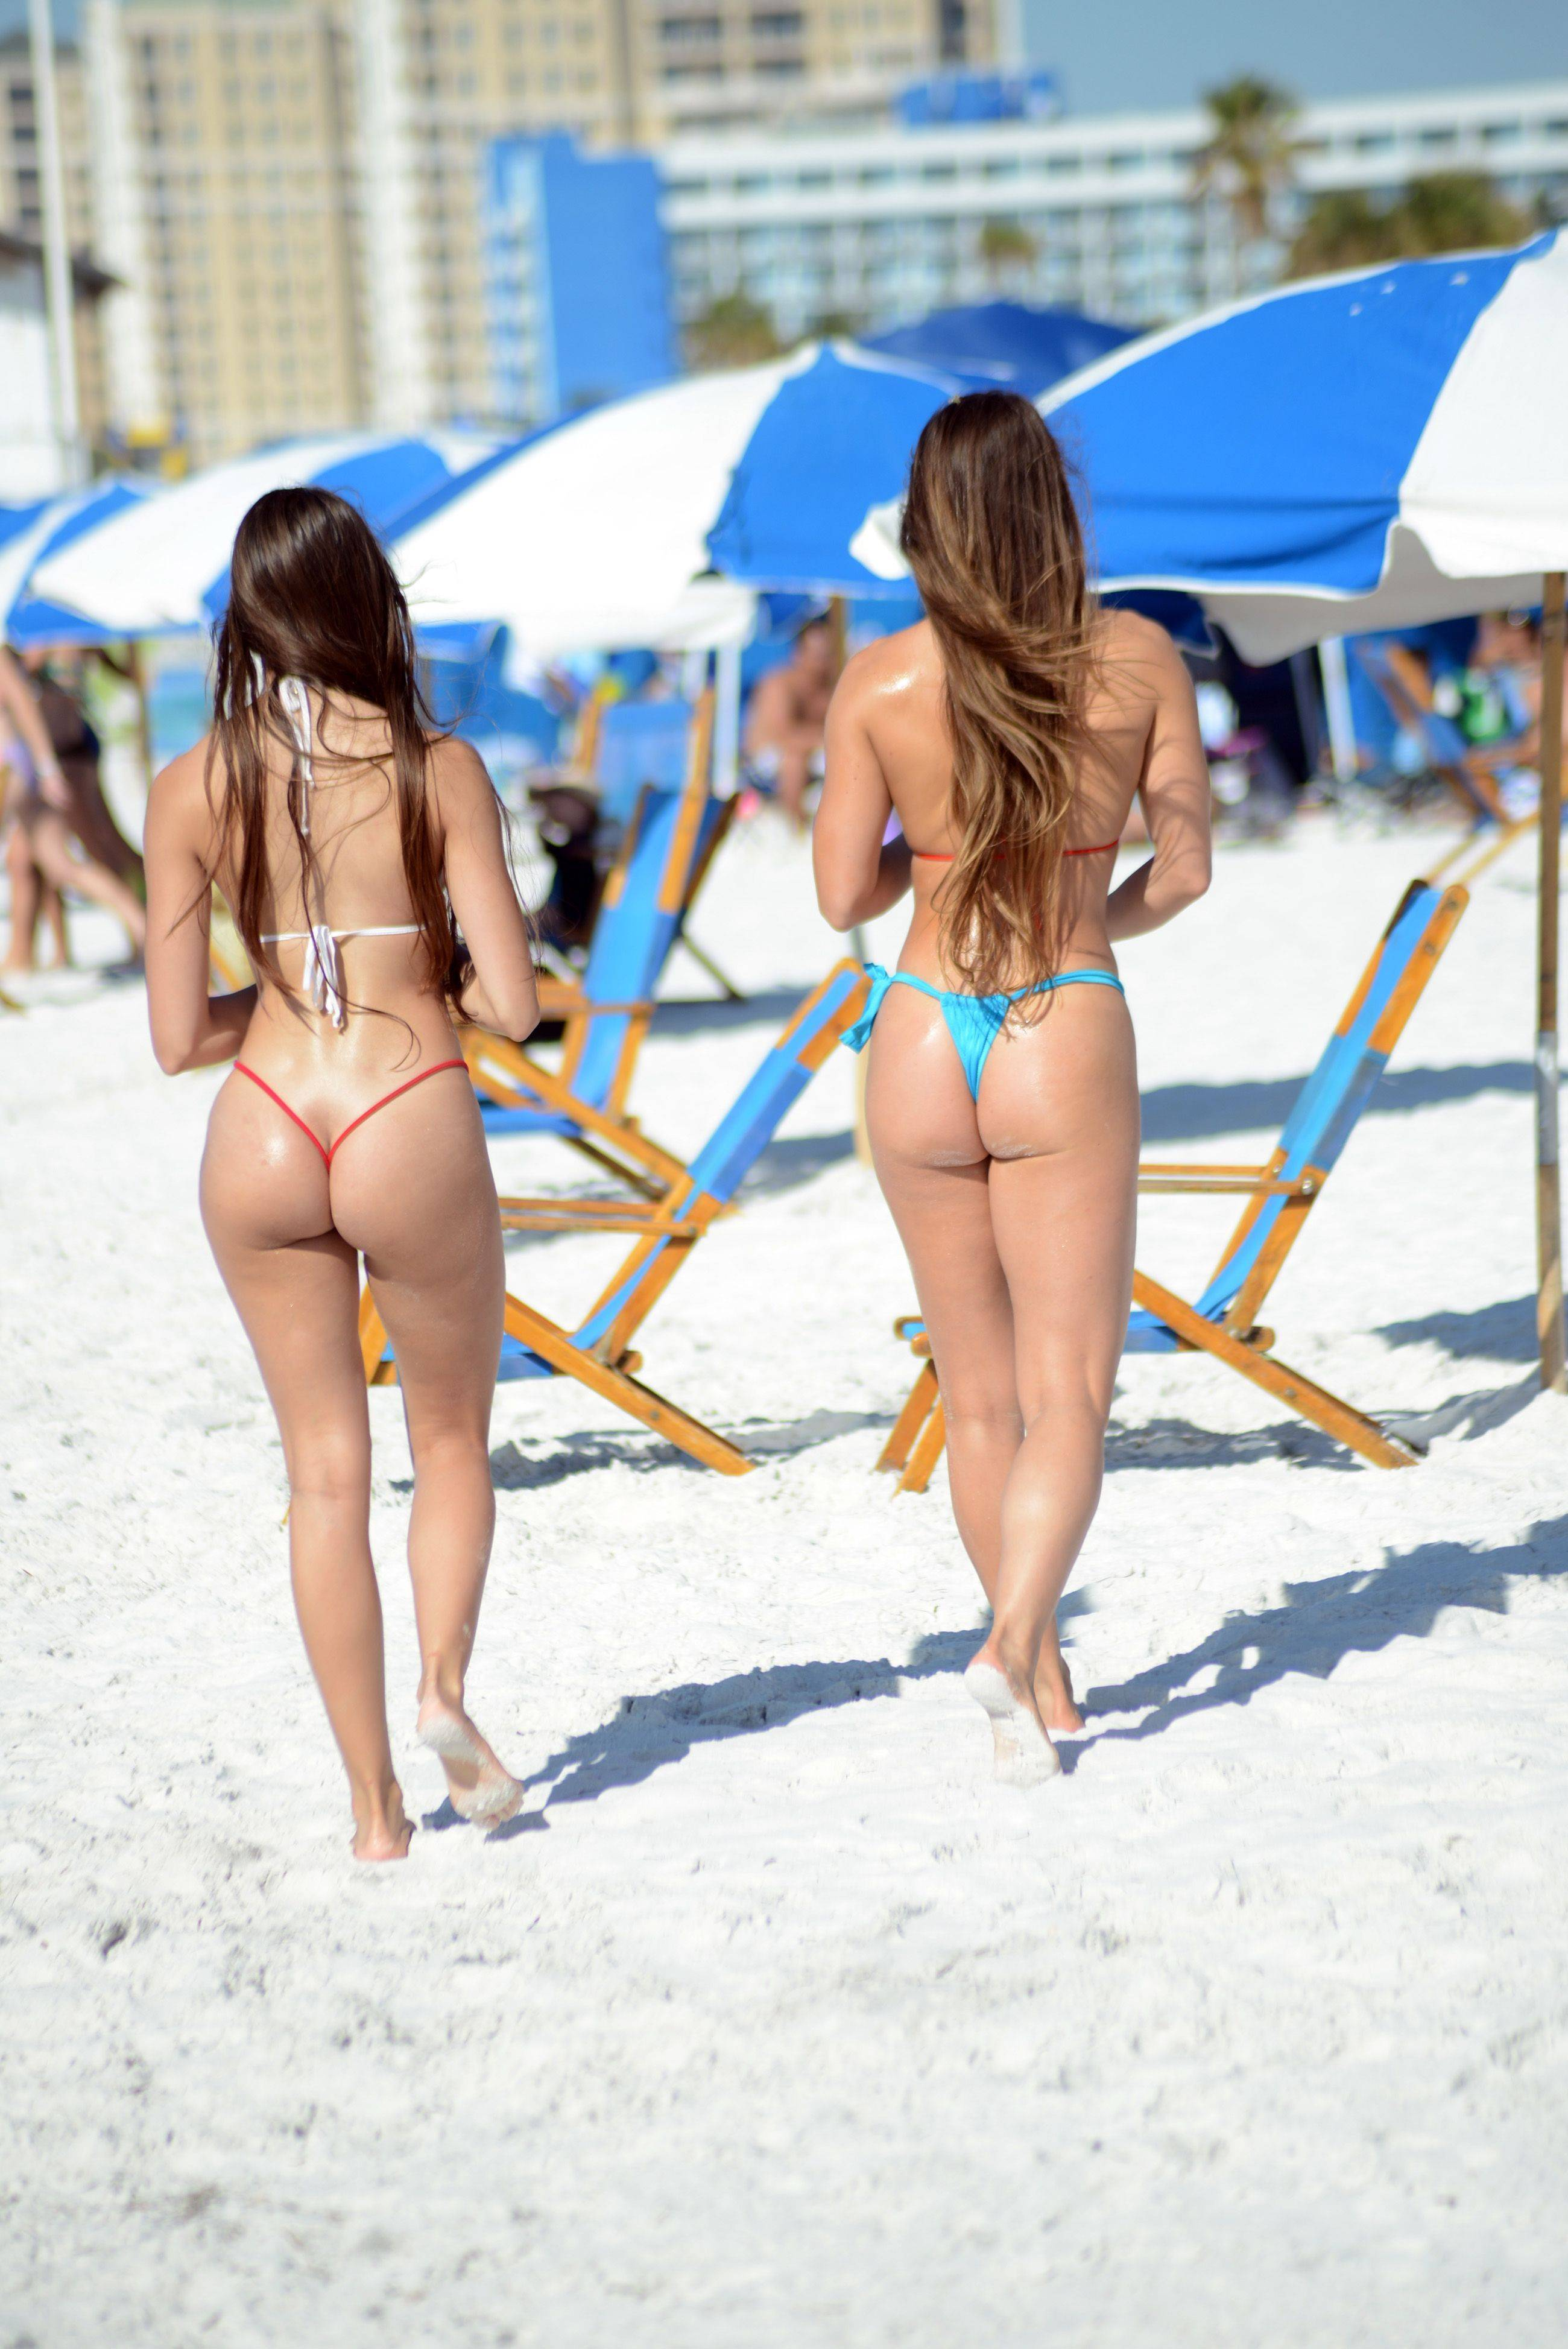 Celebrity Nicole Caridad nudes (43 photo), Sexy, Leaked, Instagram, legs 2017